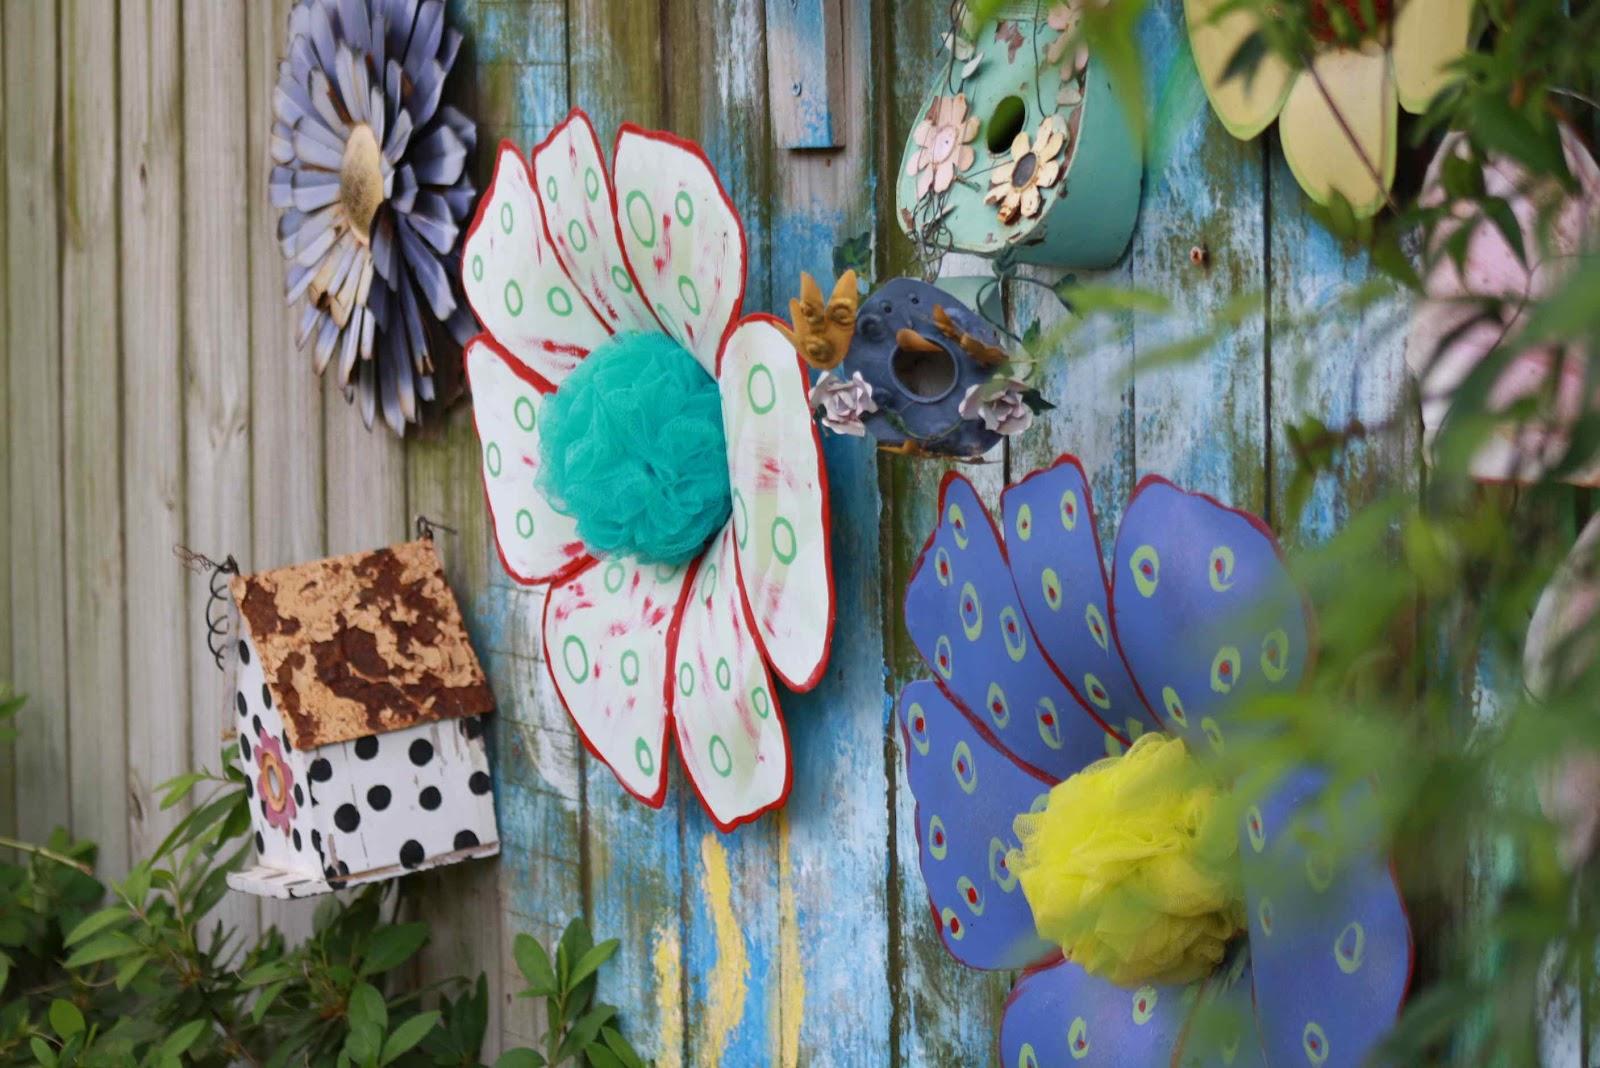 Roses and Other Gardening Joys: Artistically Amusing - Garden Tour